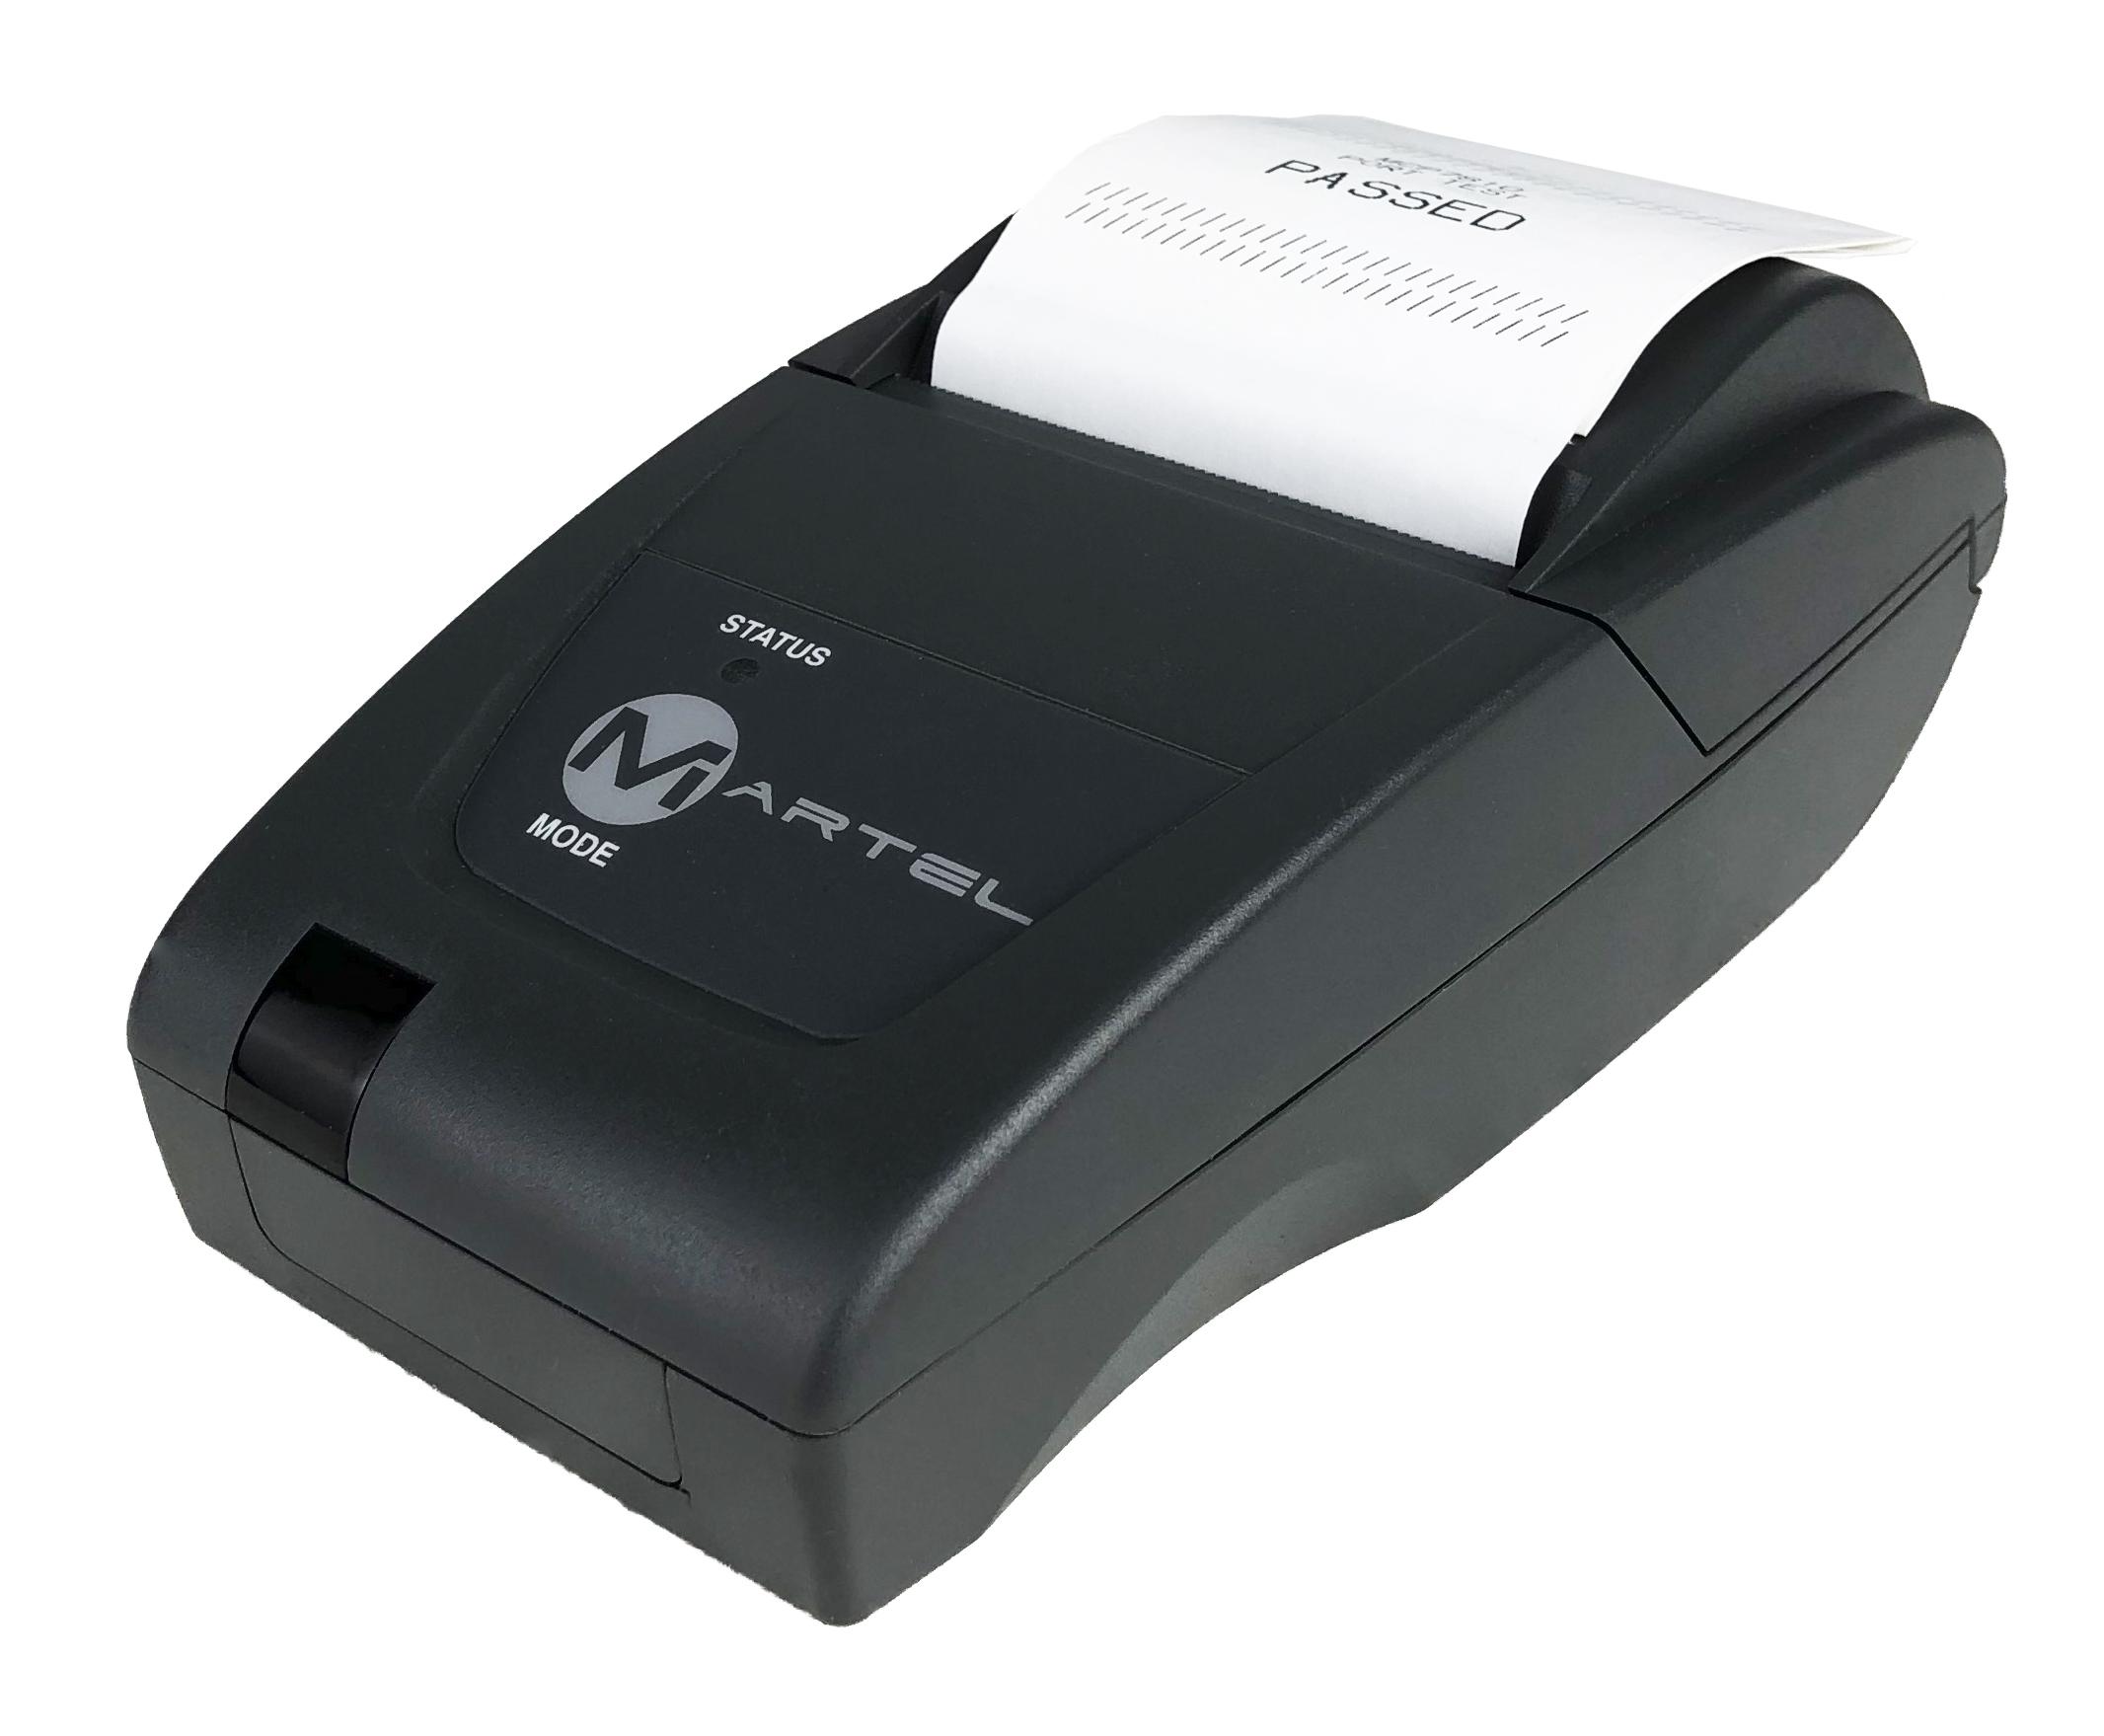 csg_printer